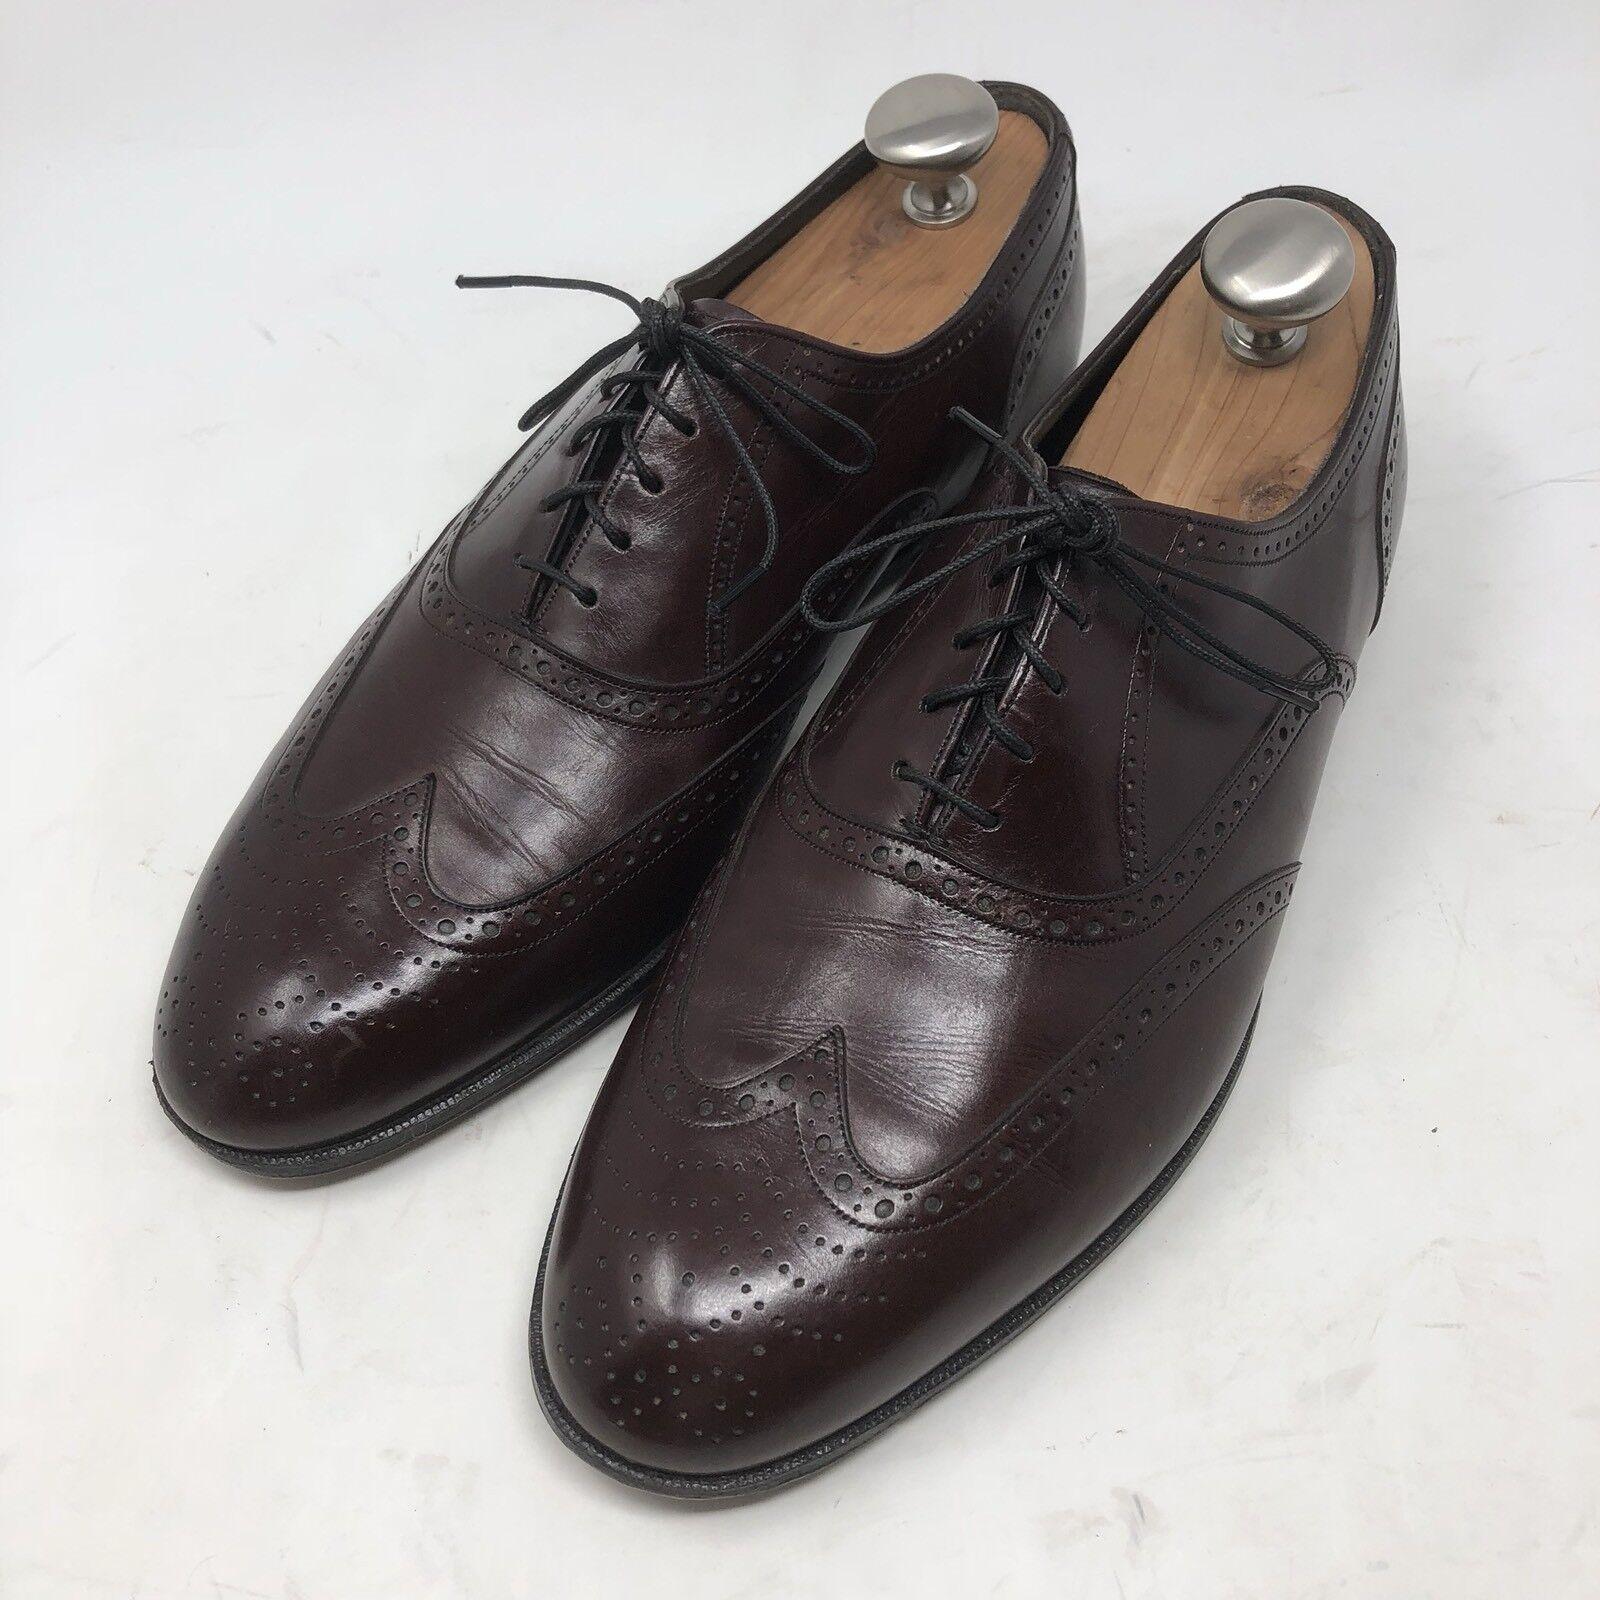 FLORSHEIM Royal Imperial Burgundy Leather WingTip Oxford Brogue Sz 9.5 D Vintage